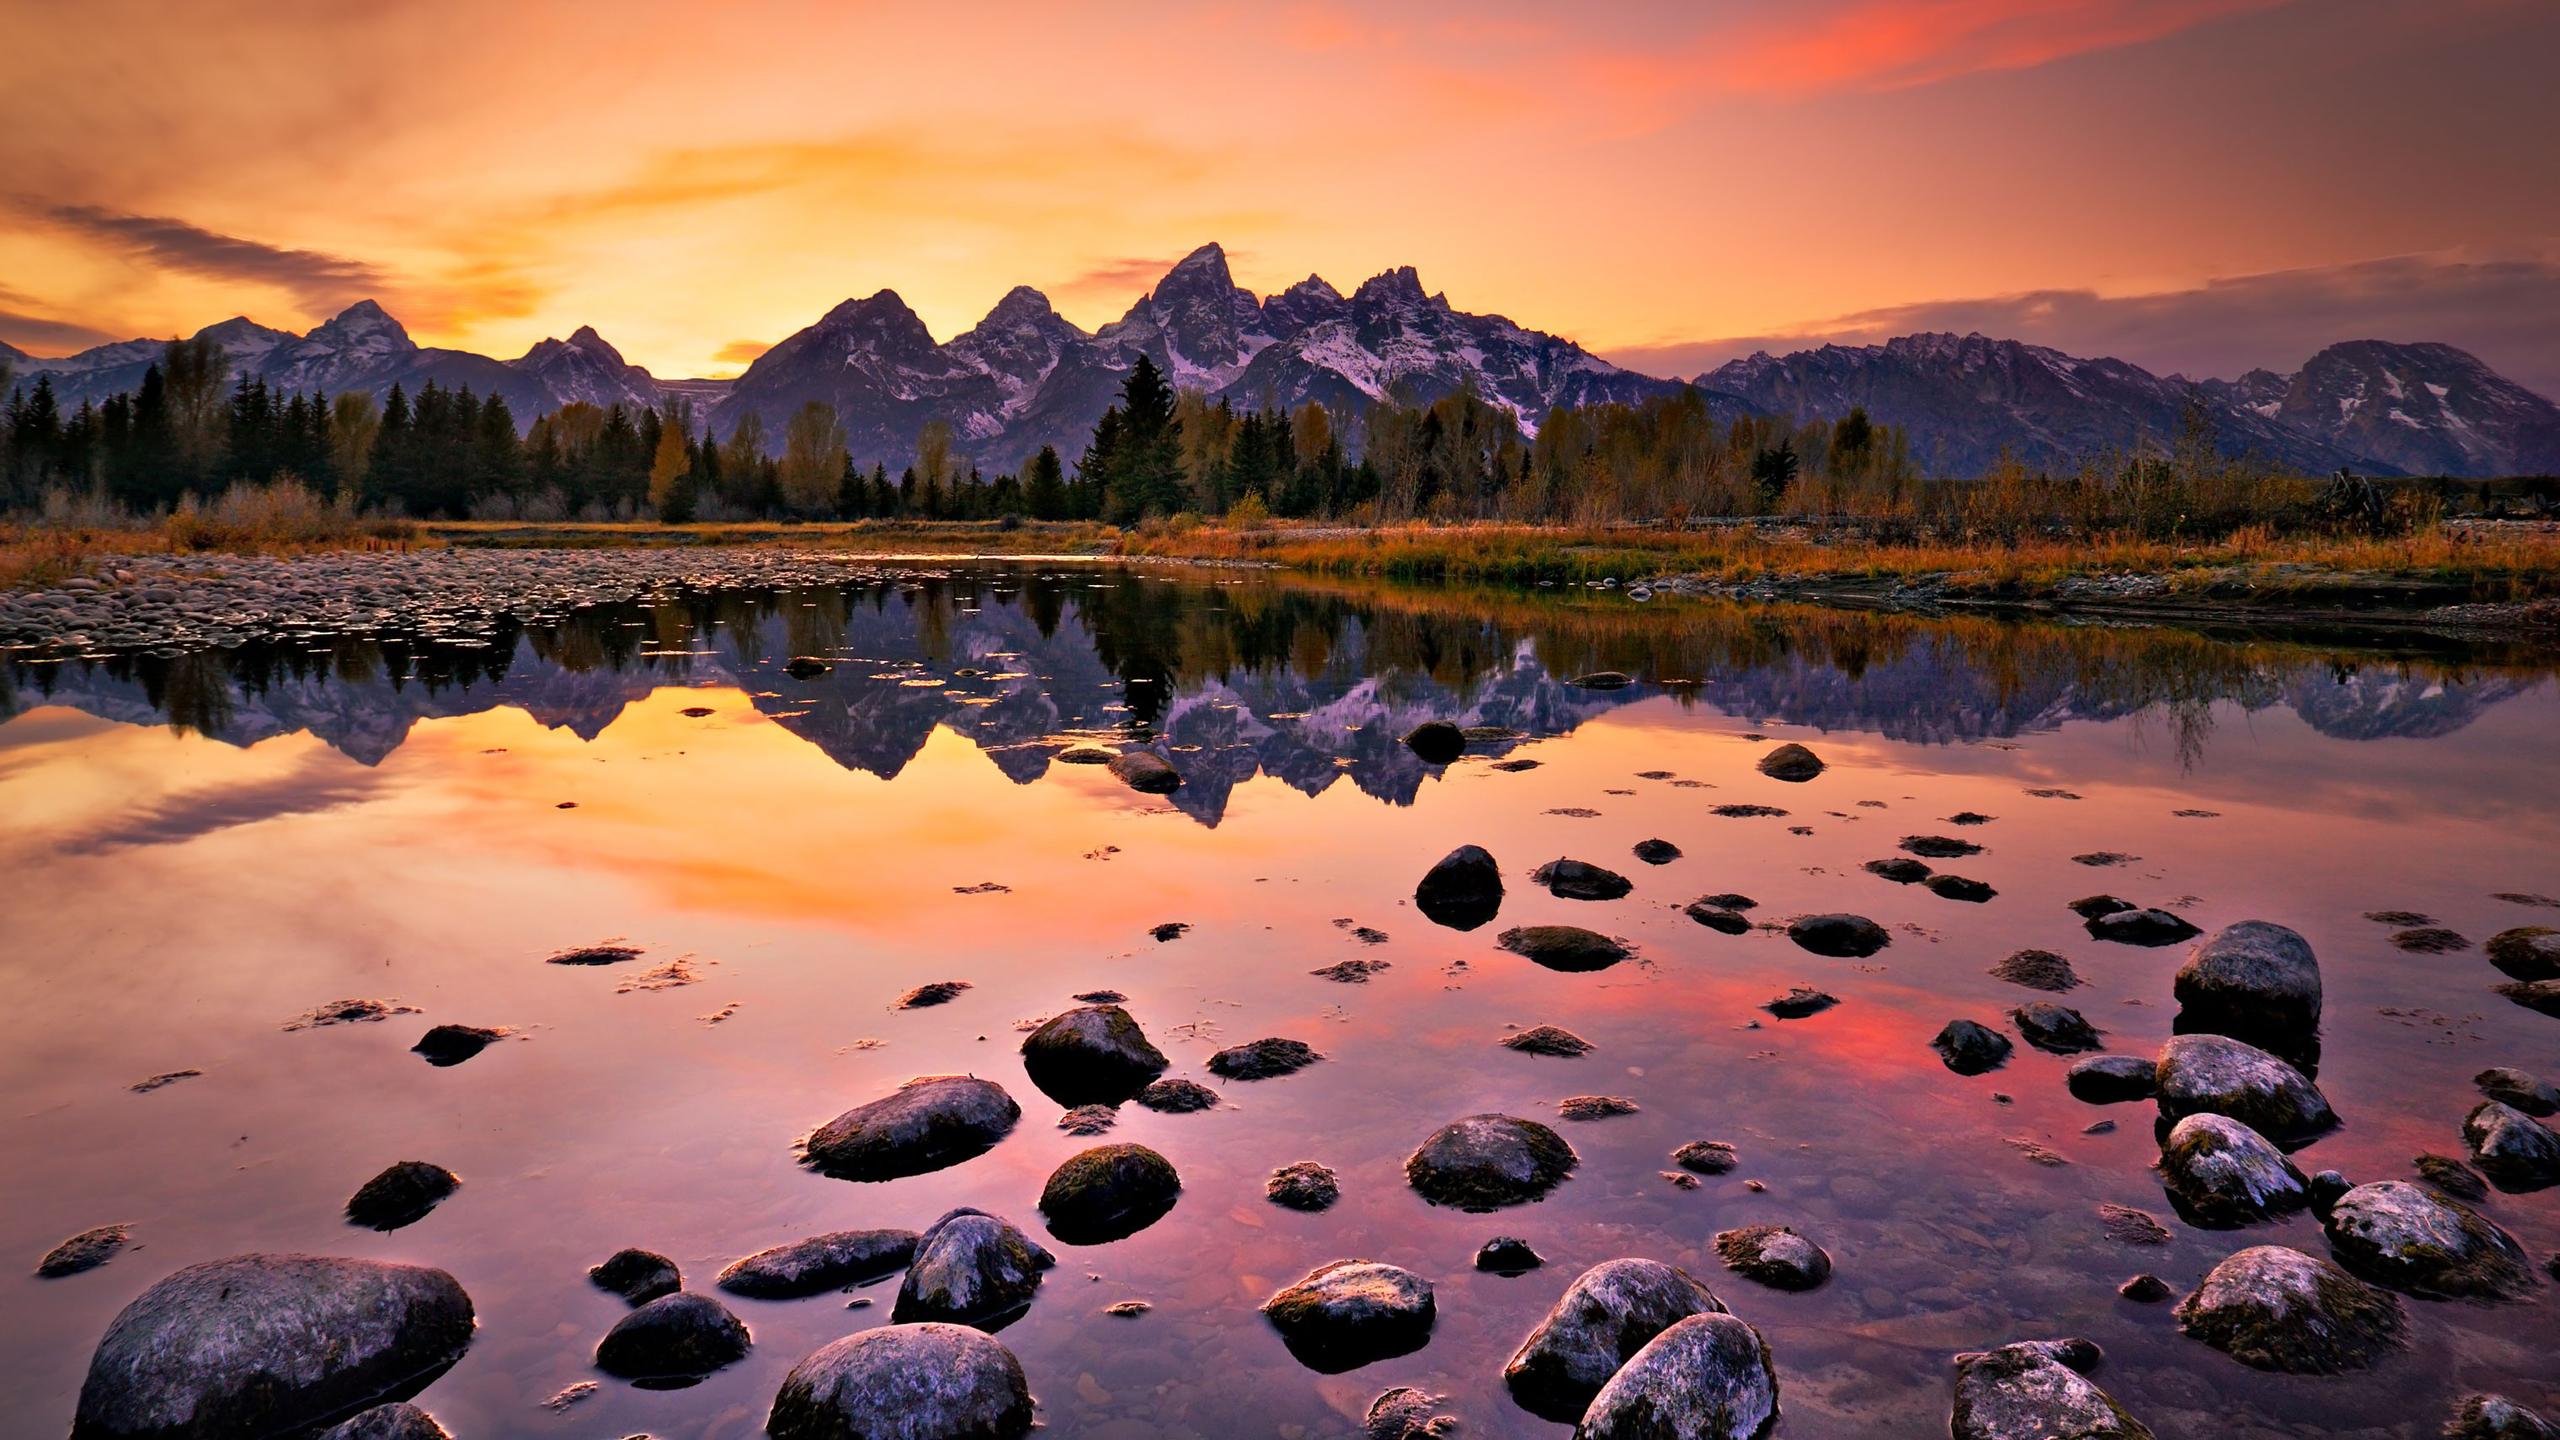 Обои фото картинки природы пейзажи